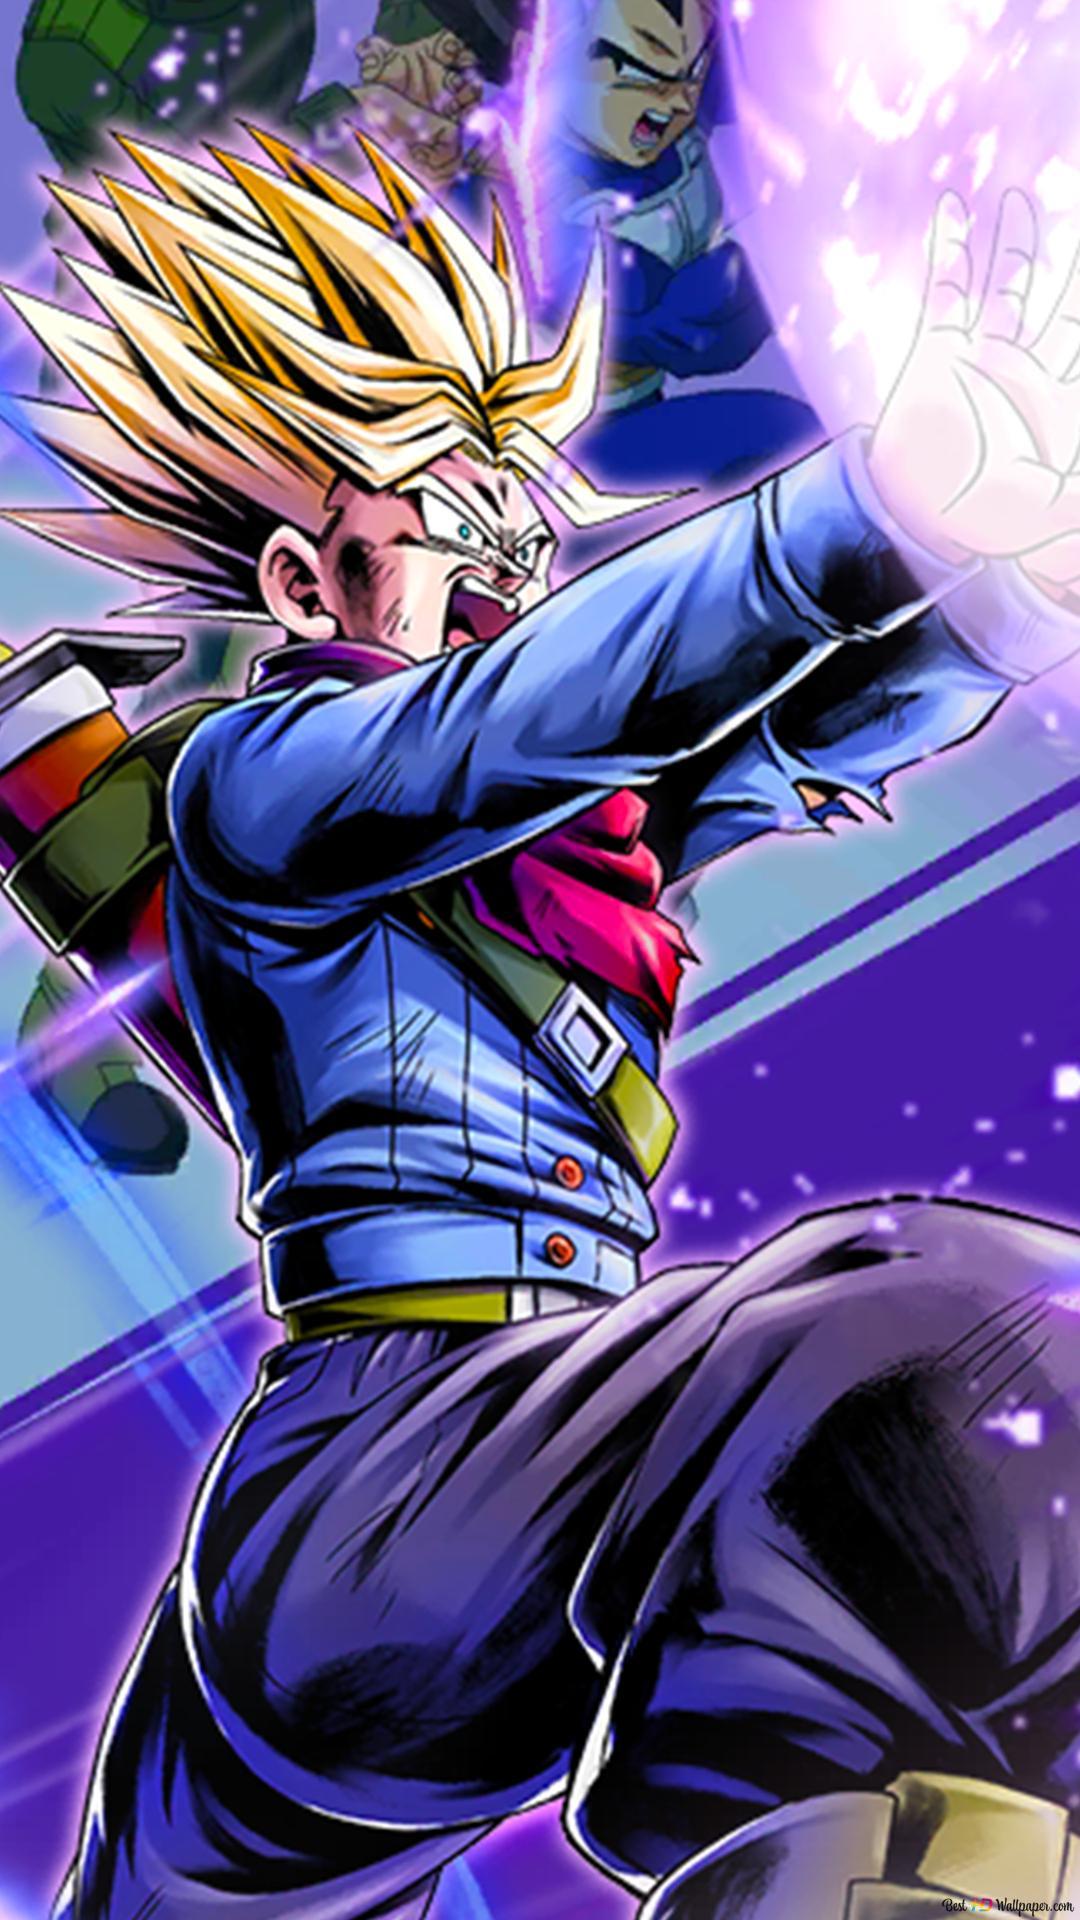 Super Saiyan Trunks Galick Gun Dari Dragon Ball Super Dragon Ball Legends Arts Untuk Desktop Unduhan Wallpaper Hd